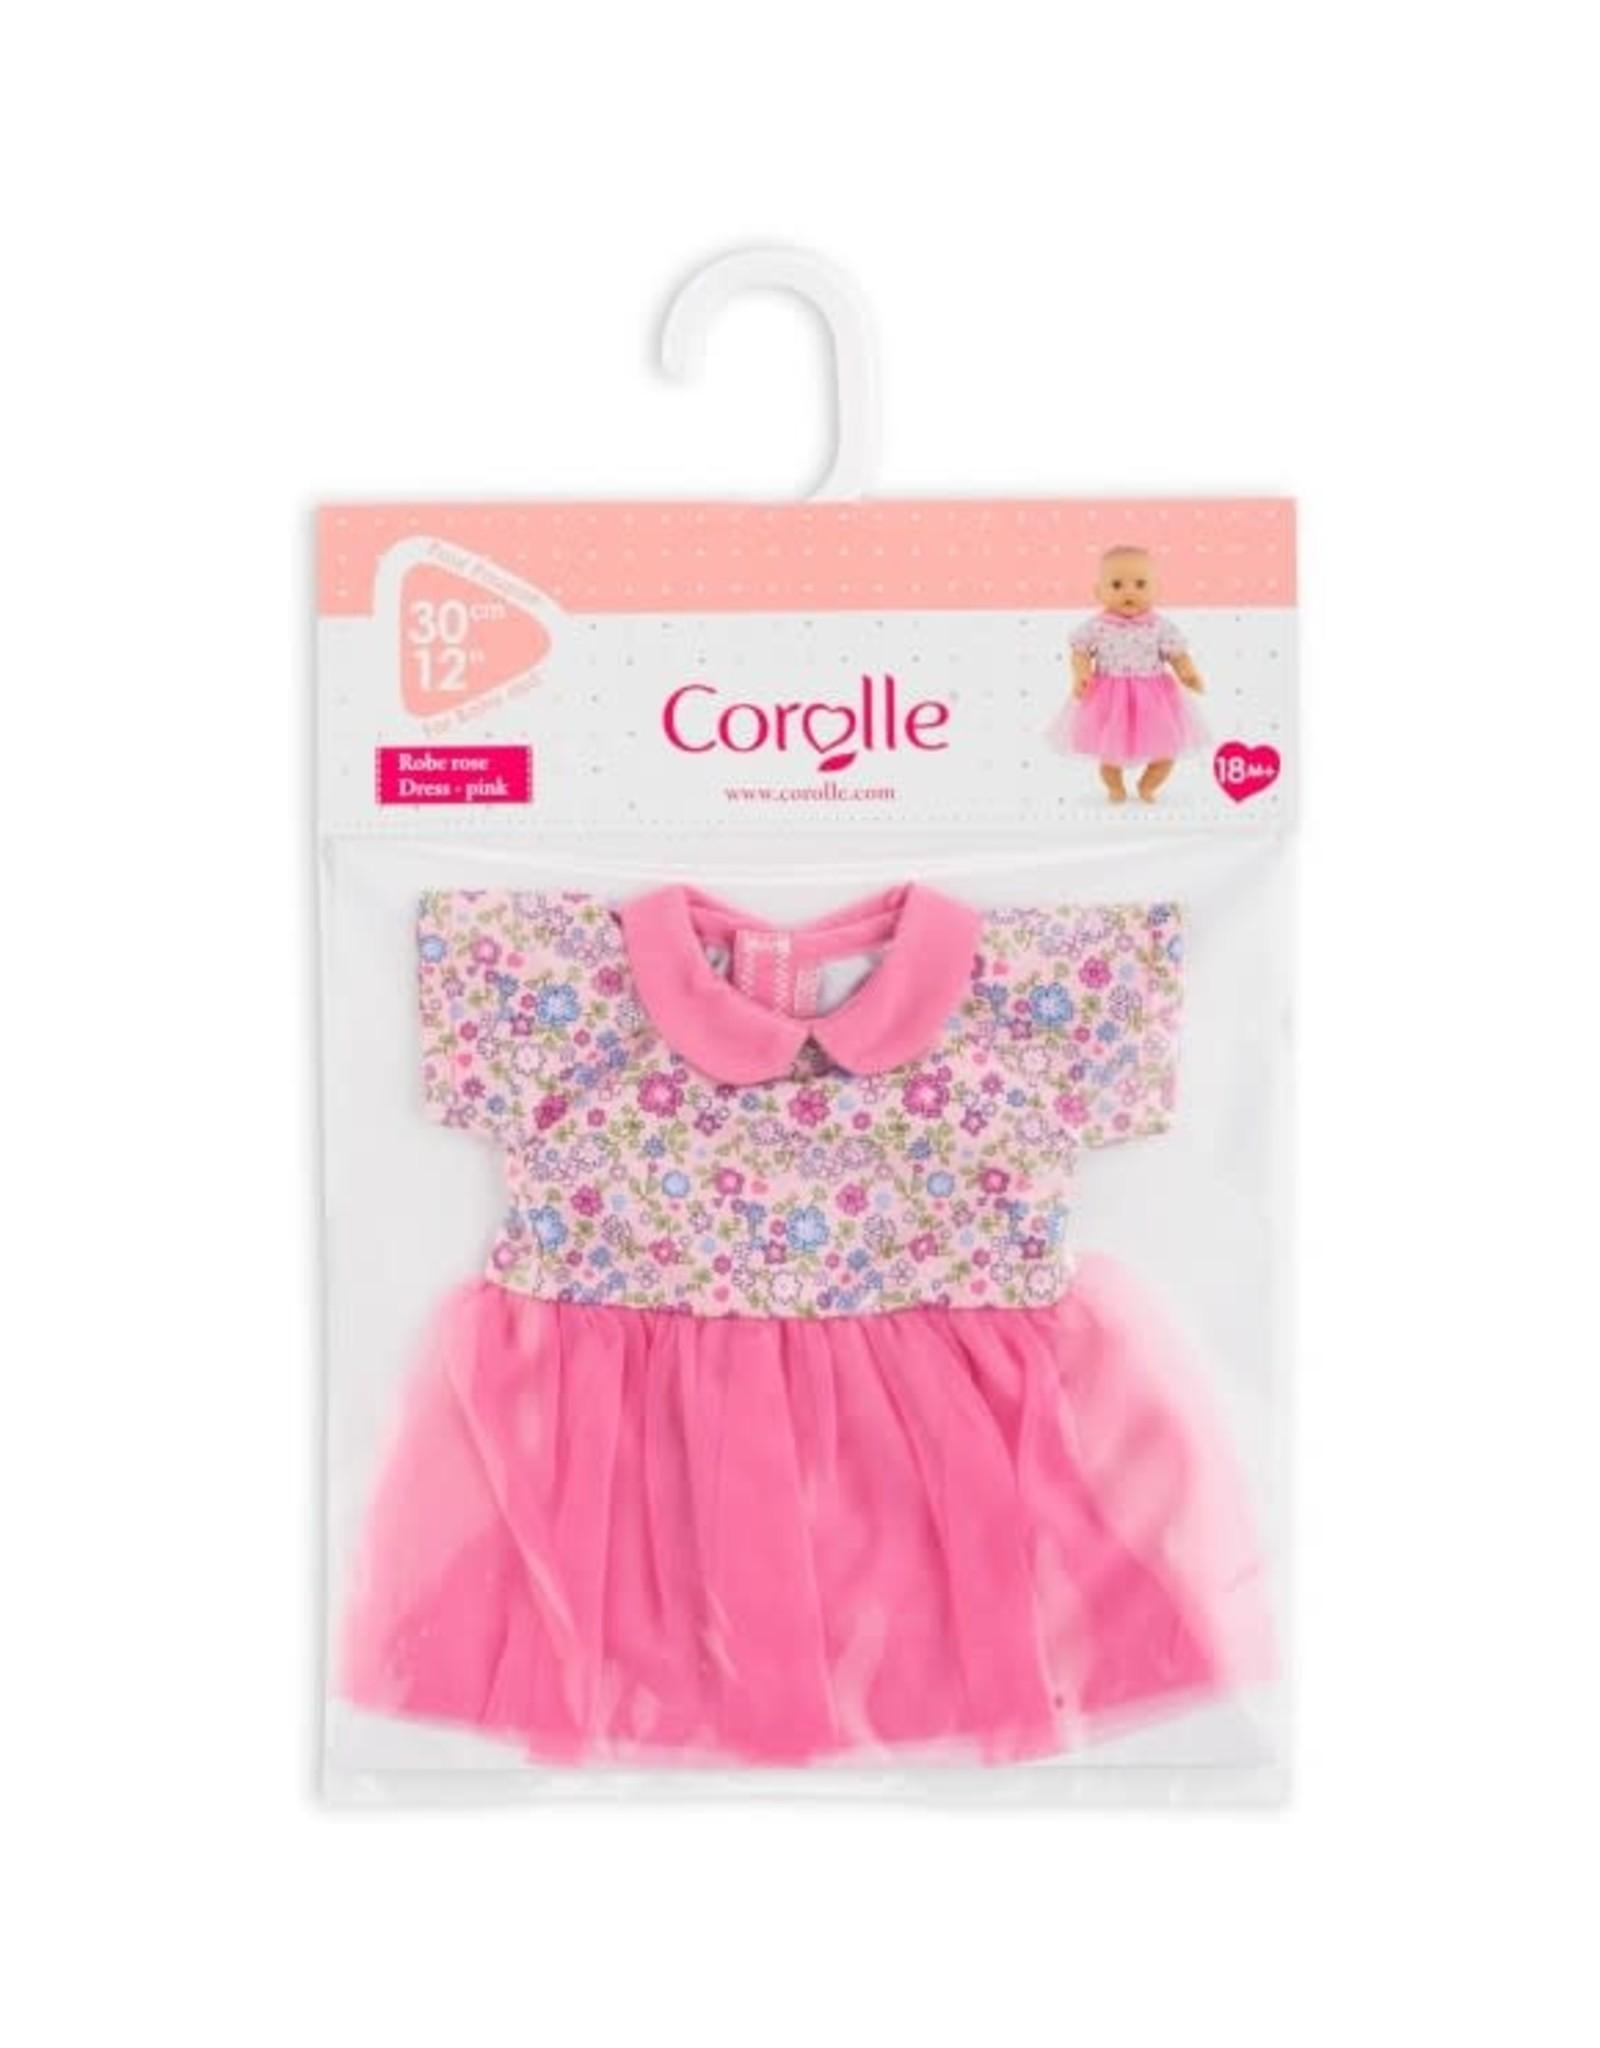 "Corolle 12"" Dress - Pink Sweet Dreams - NEW"